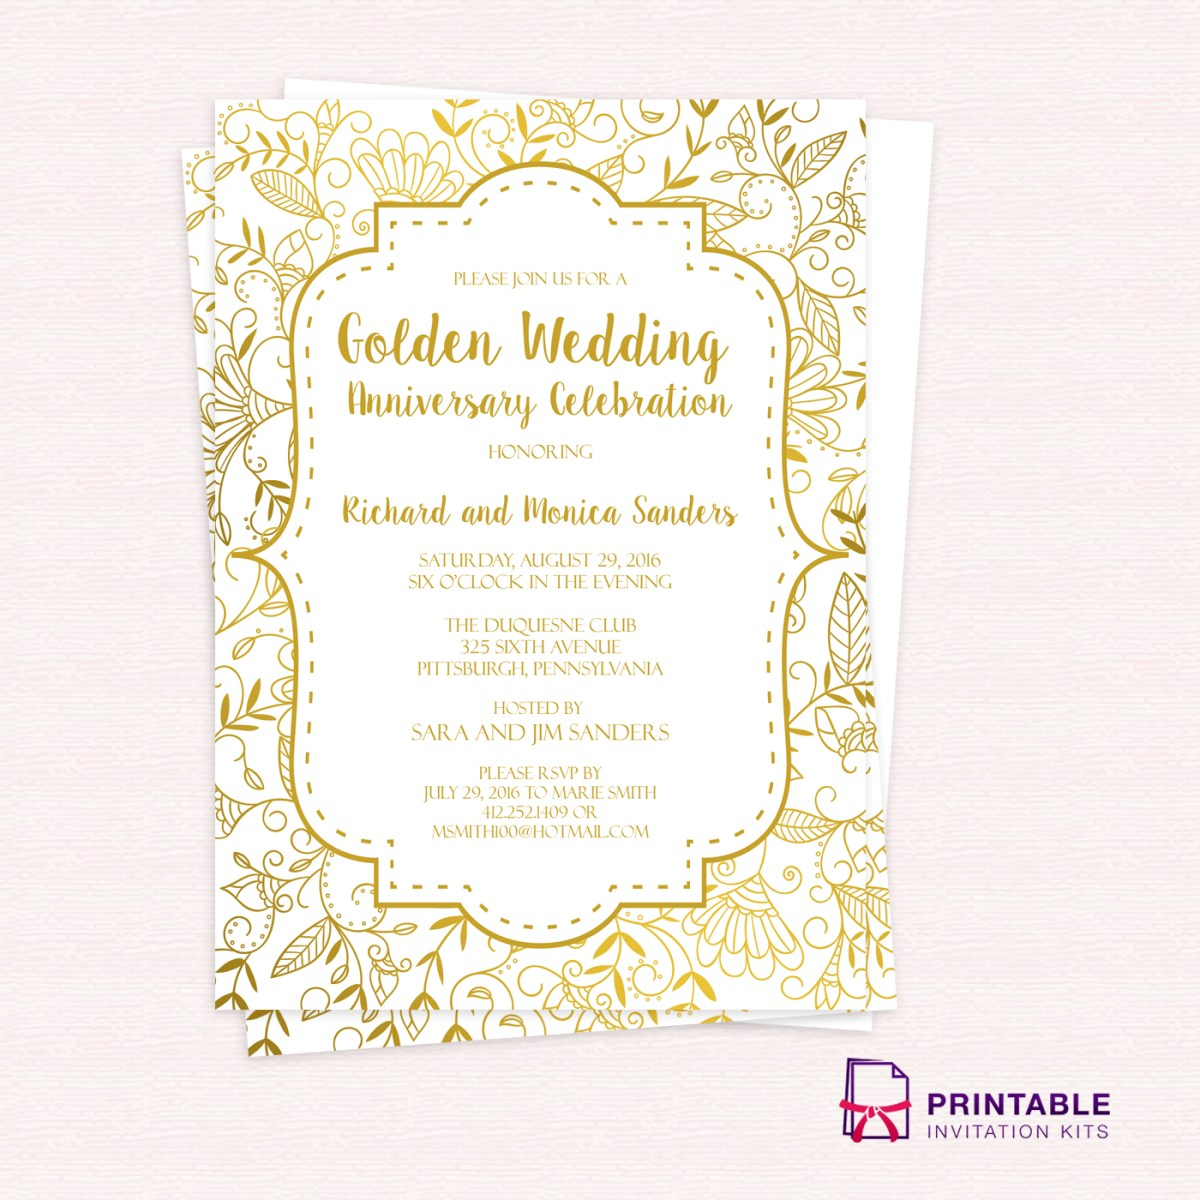 50Th Wedding Invitations Golden Wedding Anniversary Invitation Template 50th Wedding